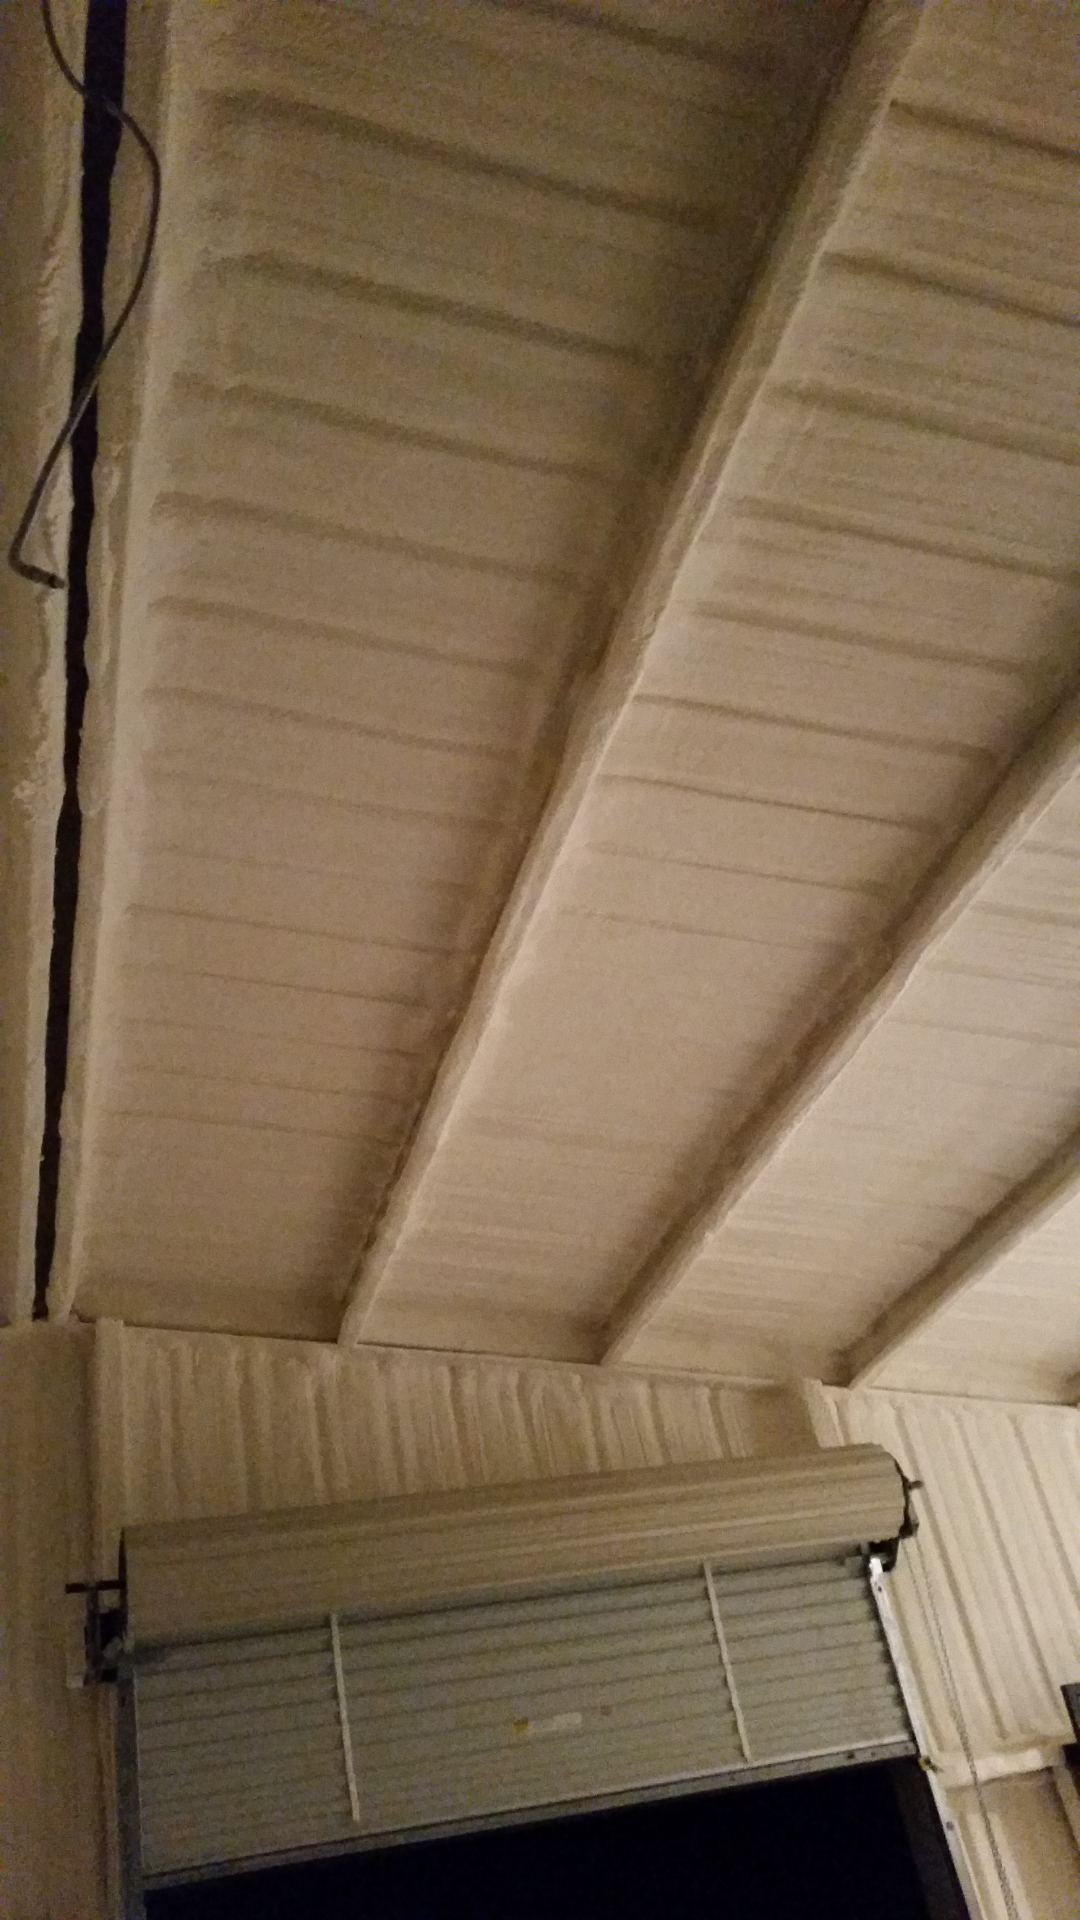 G&G Foam Insulation image 4